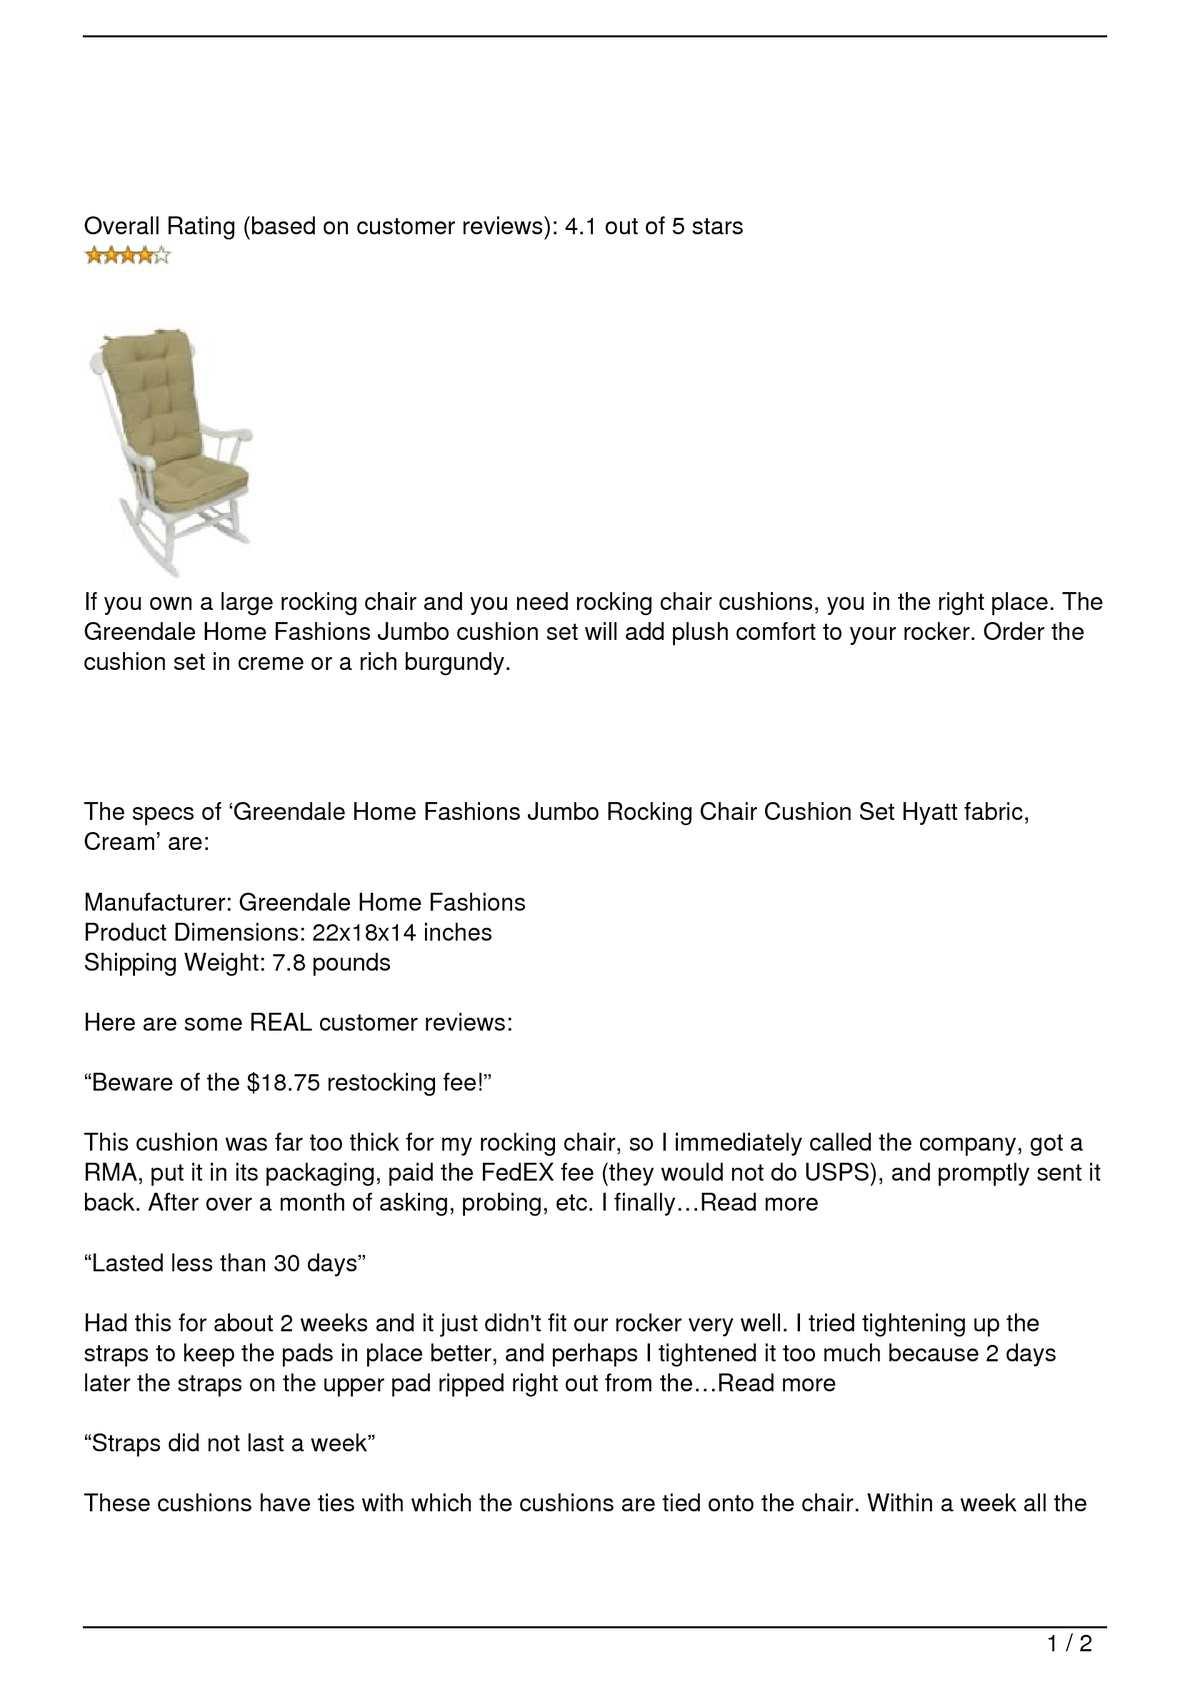 Calameo Greendale Home Fashions Jumbo Rocking Chair Cushions Review